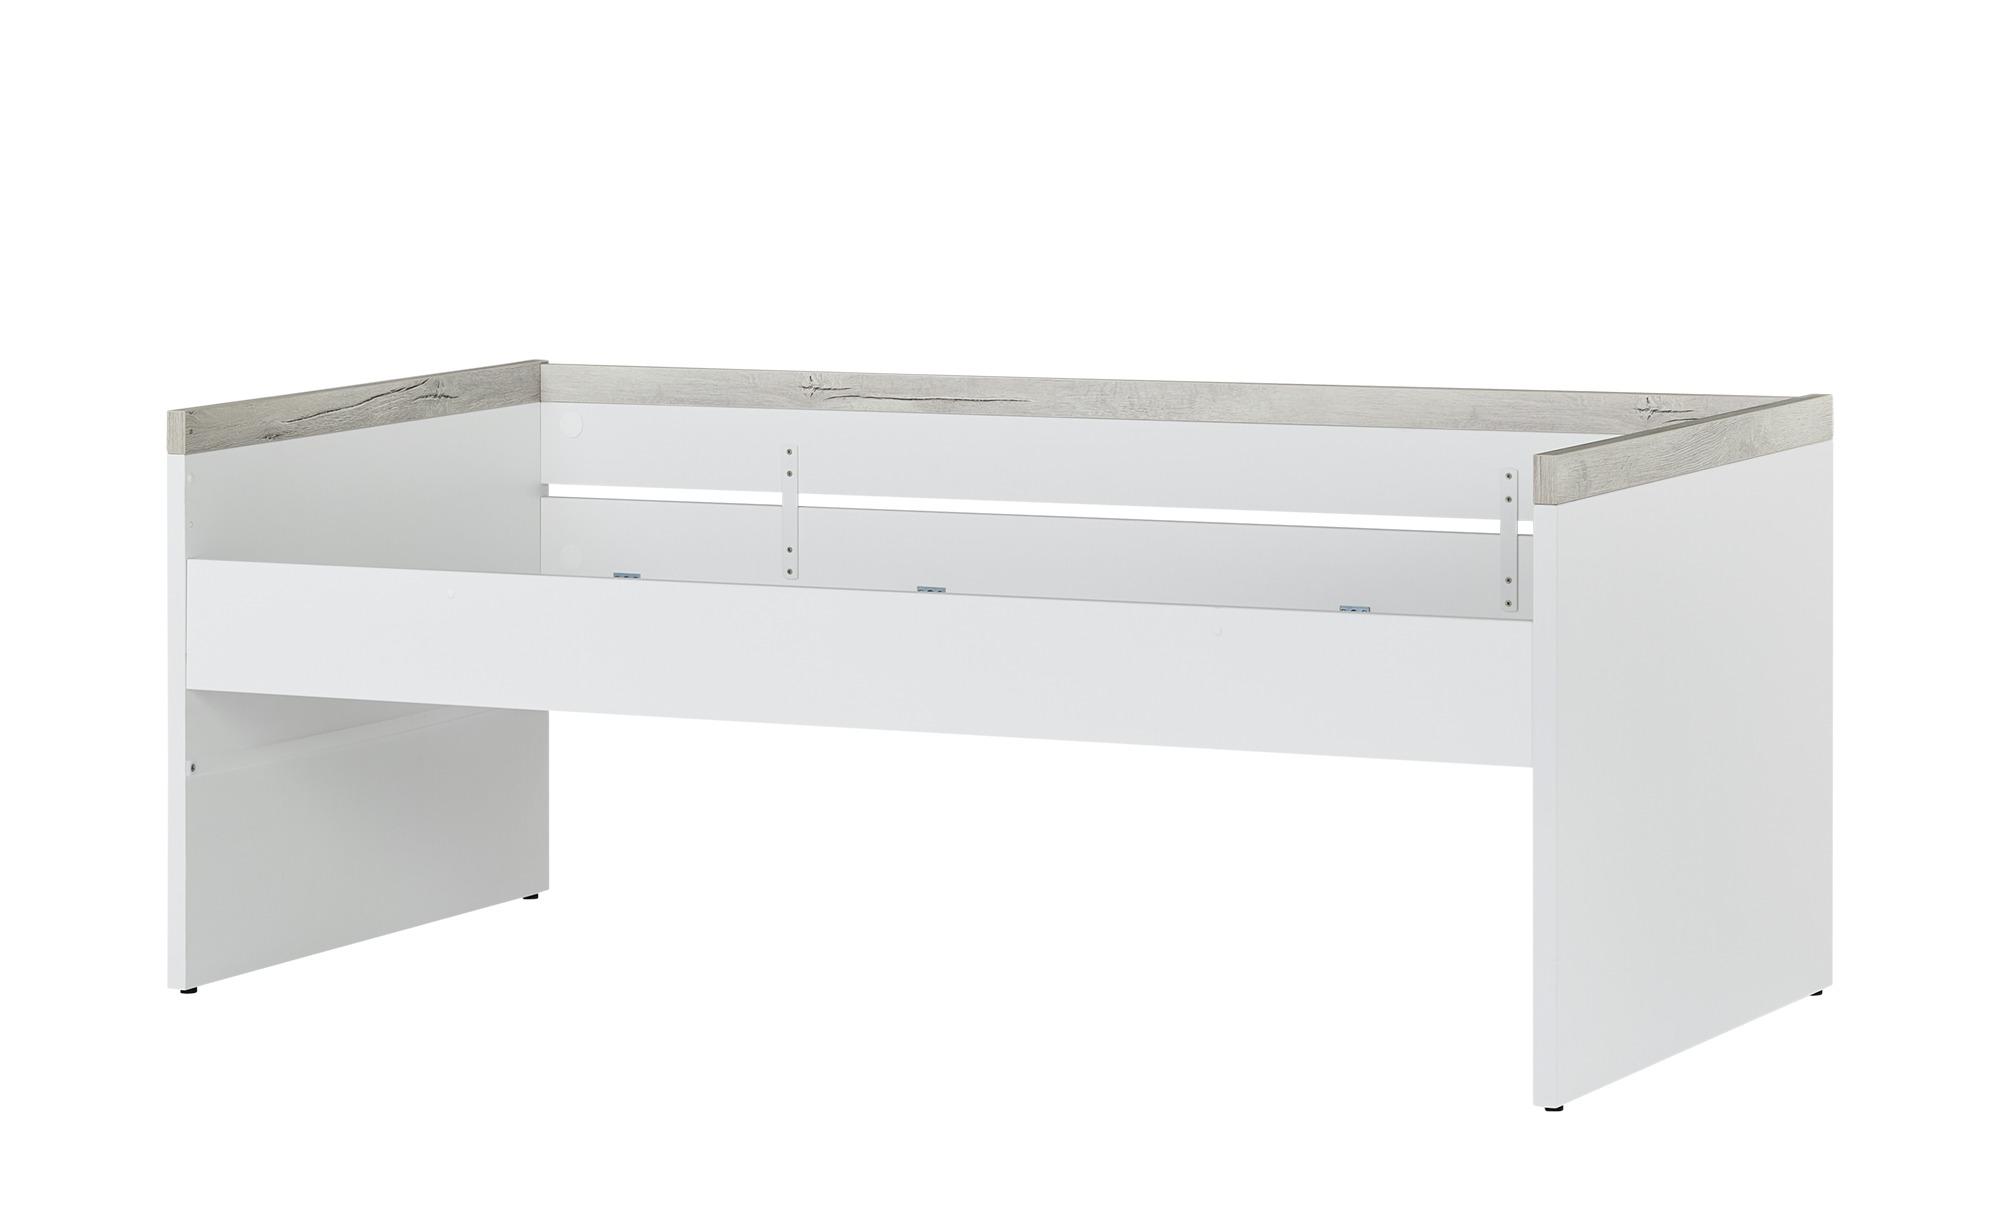 PAIDI Kojenbett  Kira - weiß - 206,1 cm - 95,7 cm - 80,8 cm - Betten > Bettgestelle - Möbel Kraft | Kinderzimmer > Jugendzimmer > Jugendbetten | PAIDI